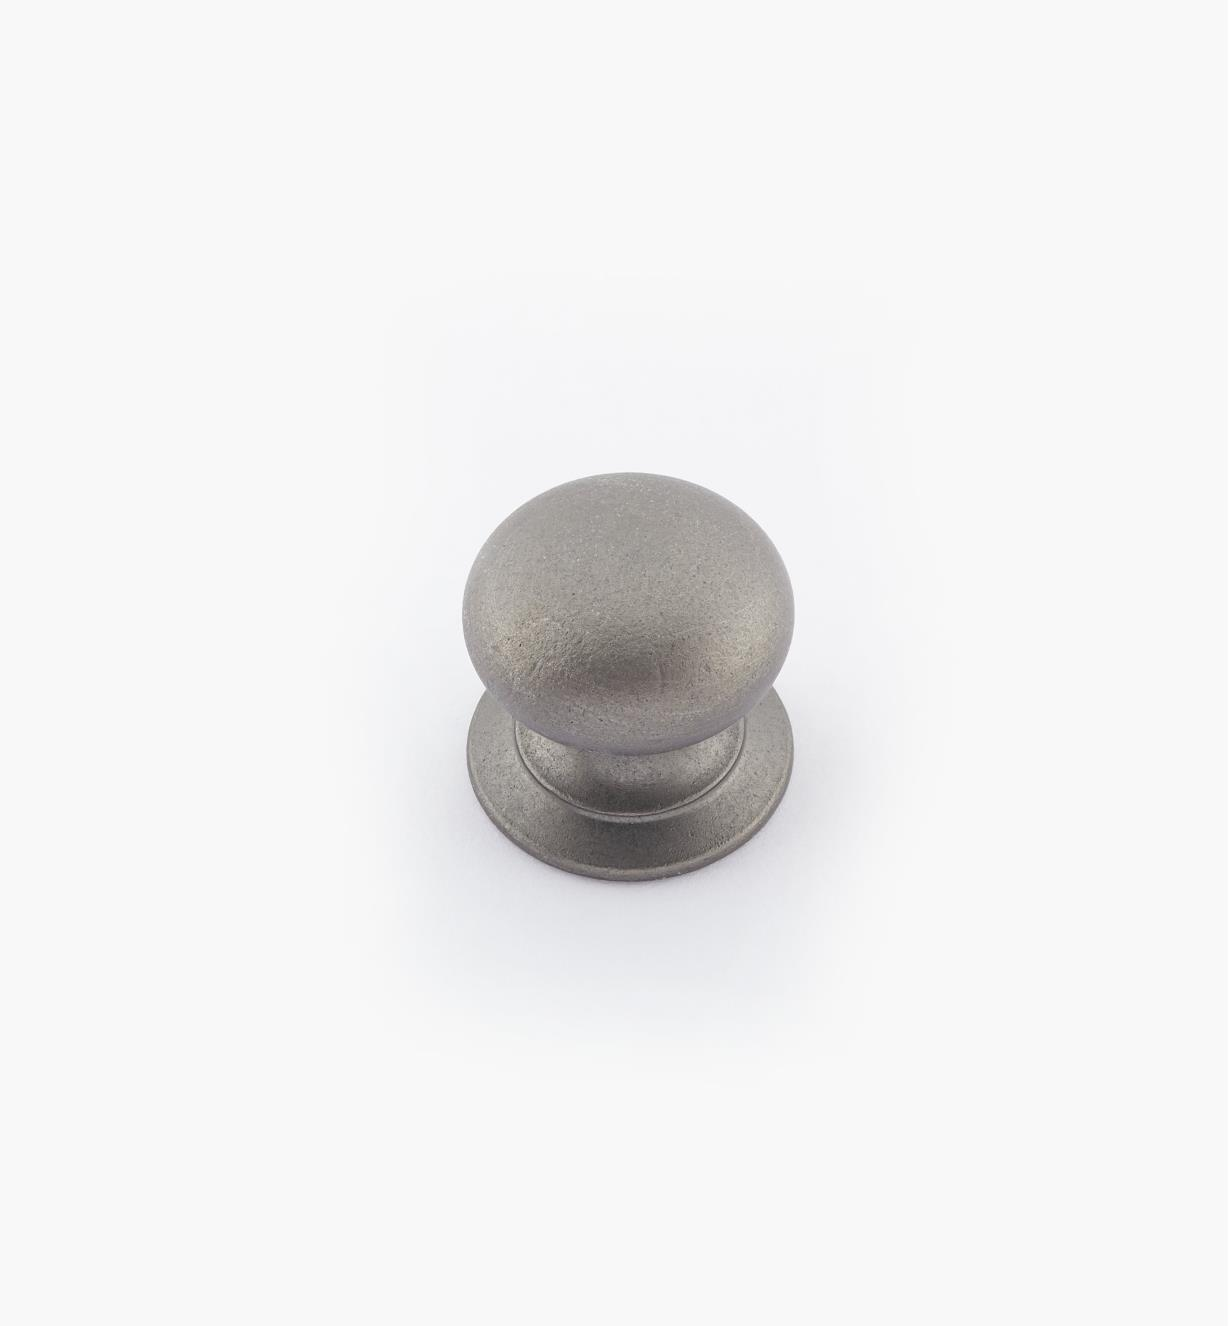 "02W2766 - 5/8"" × 5/8"" Round Brass Knob, Pewter"